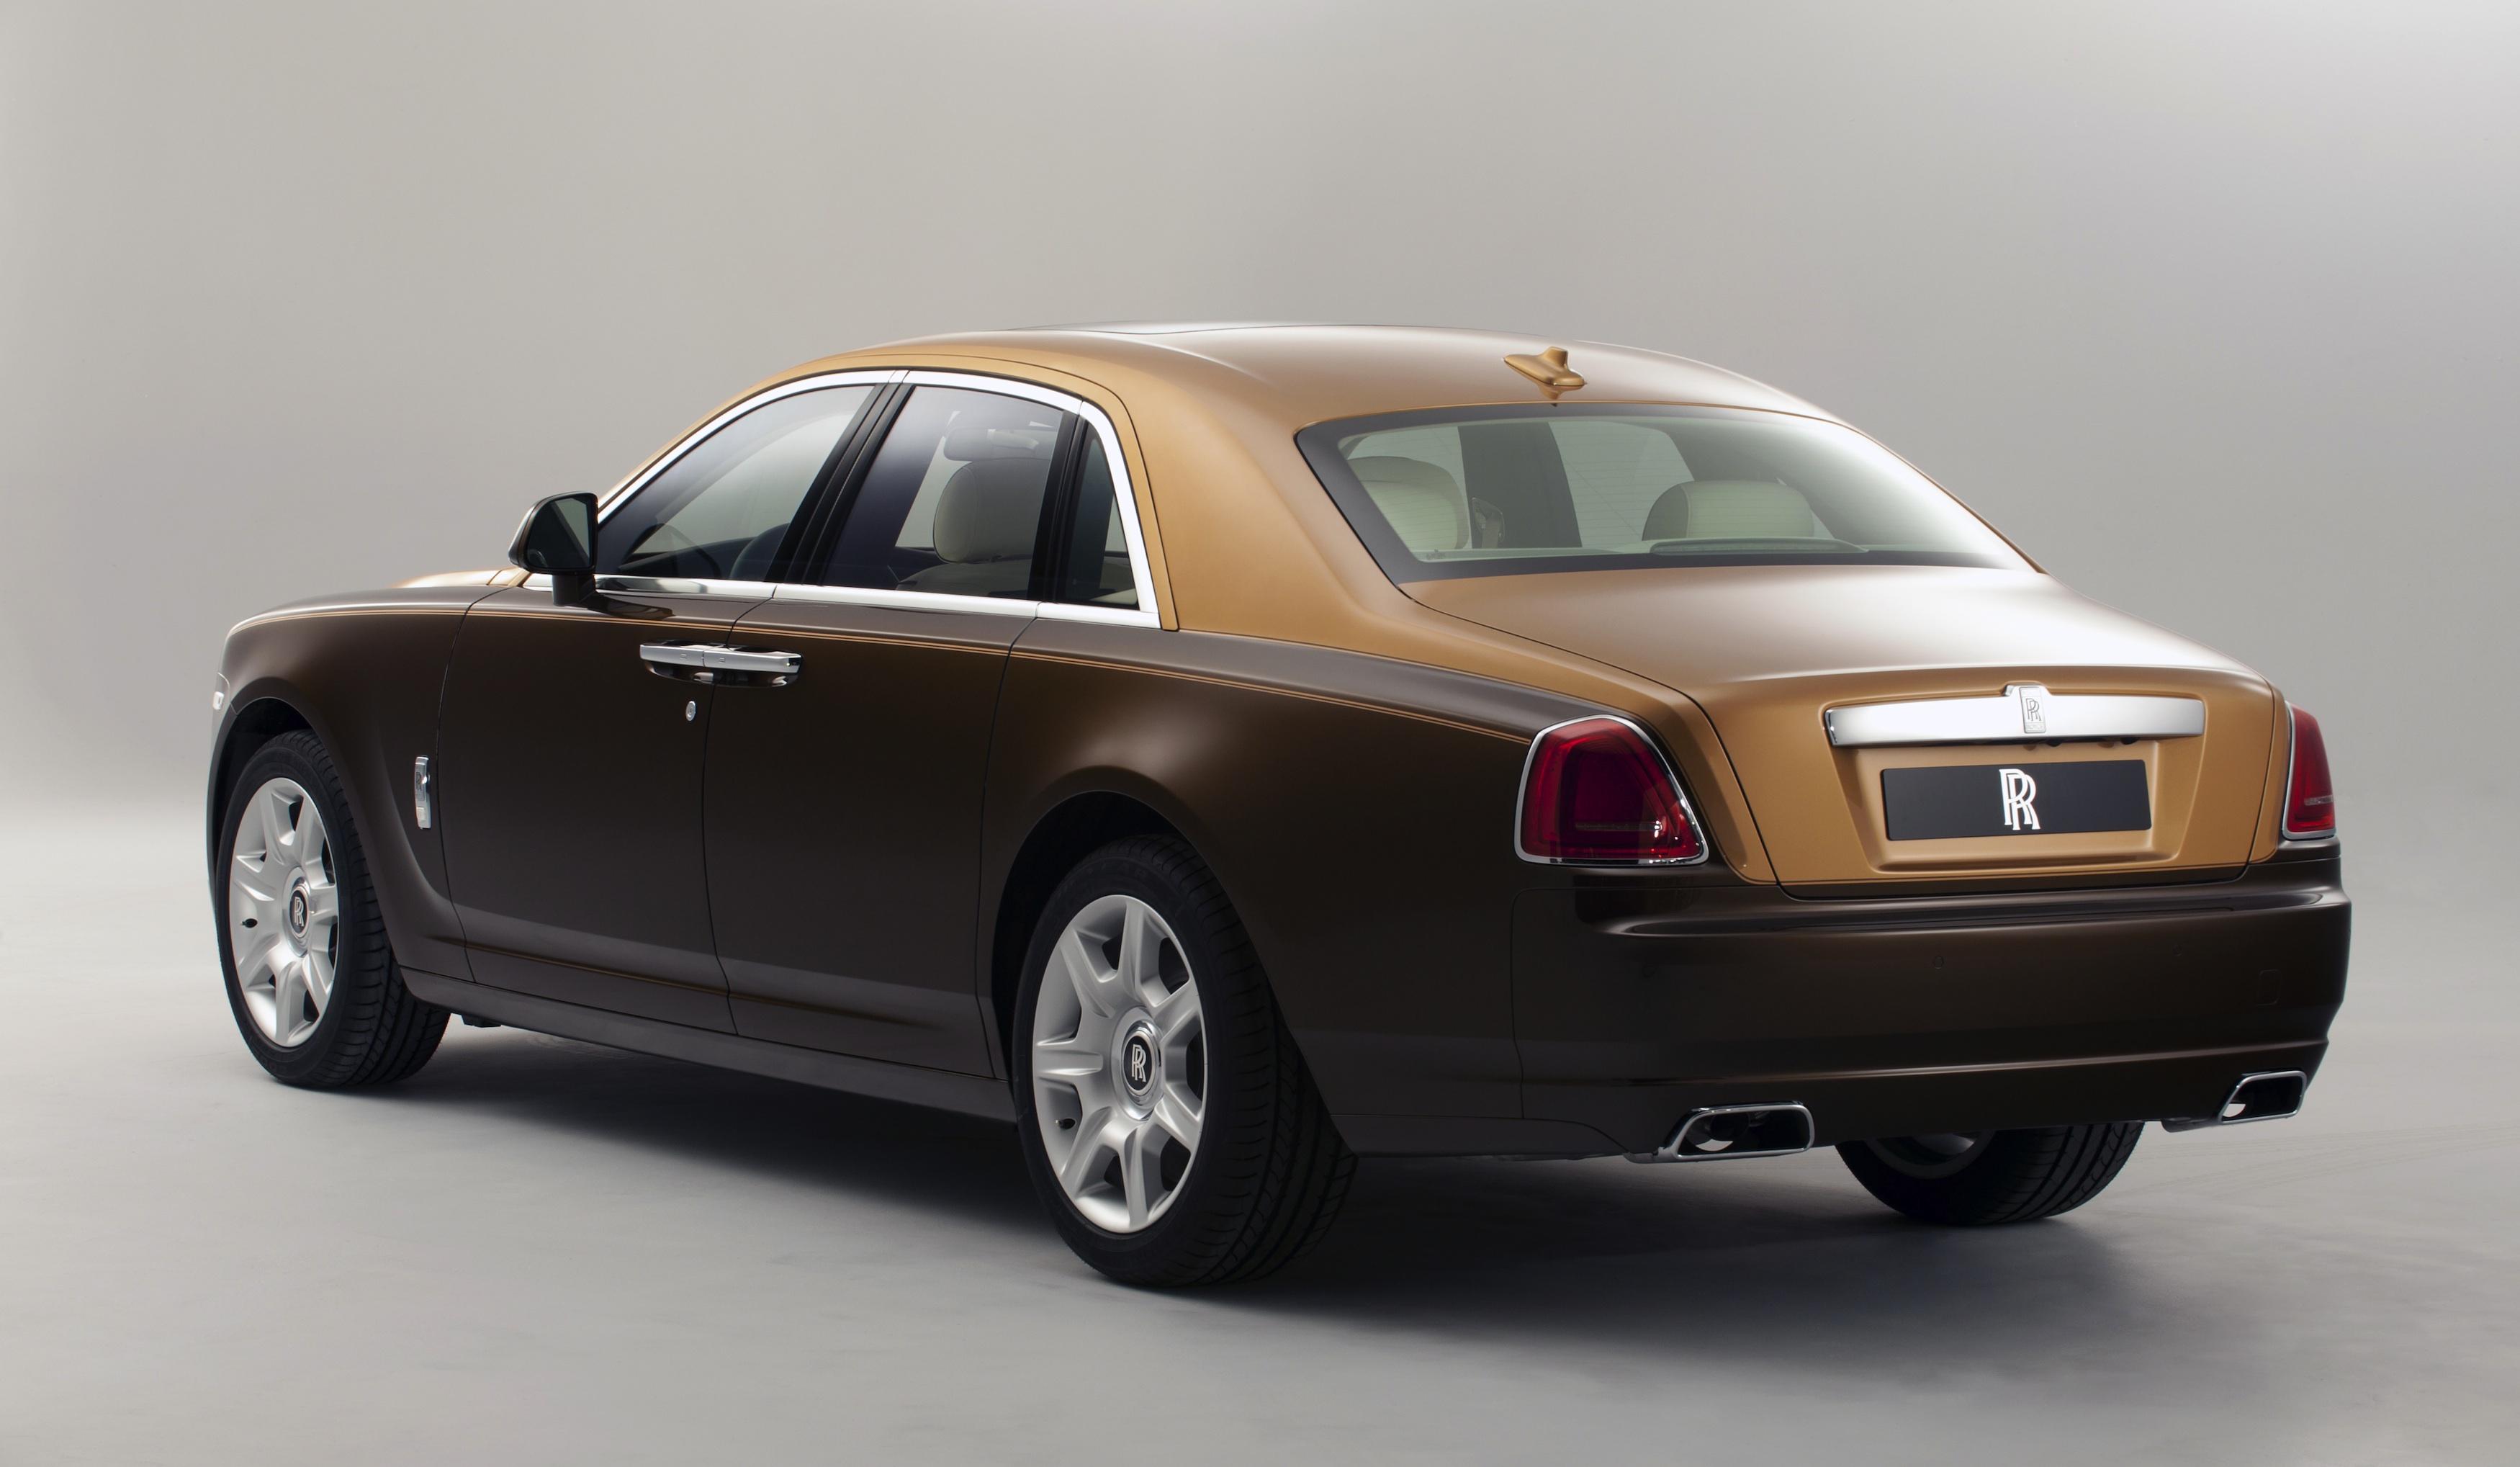 Rolls-Royce recall for Ghost and million-dollar Phantom ...